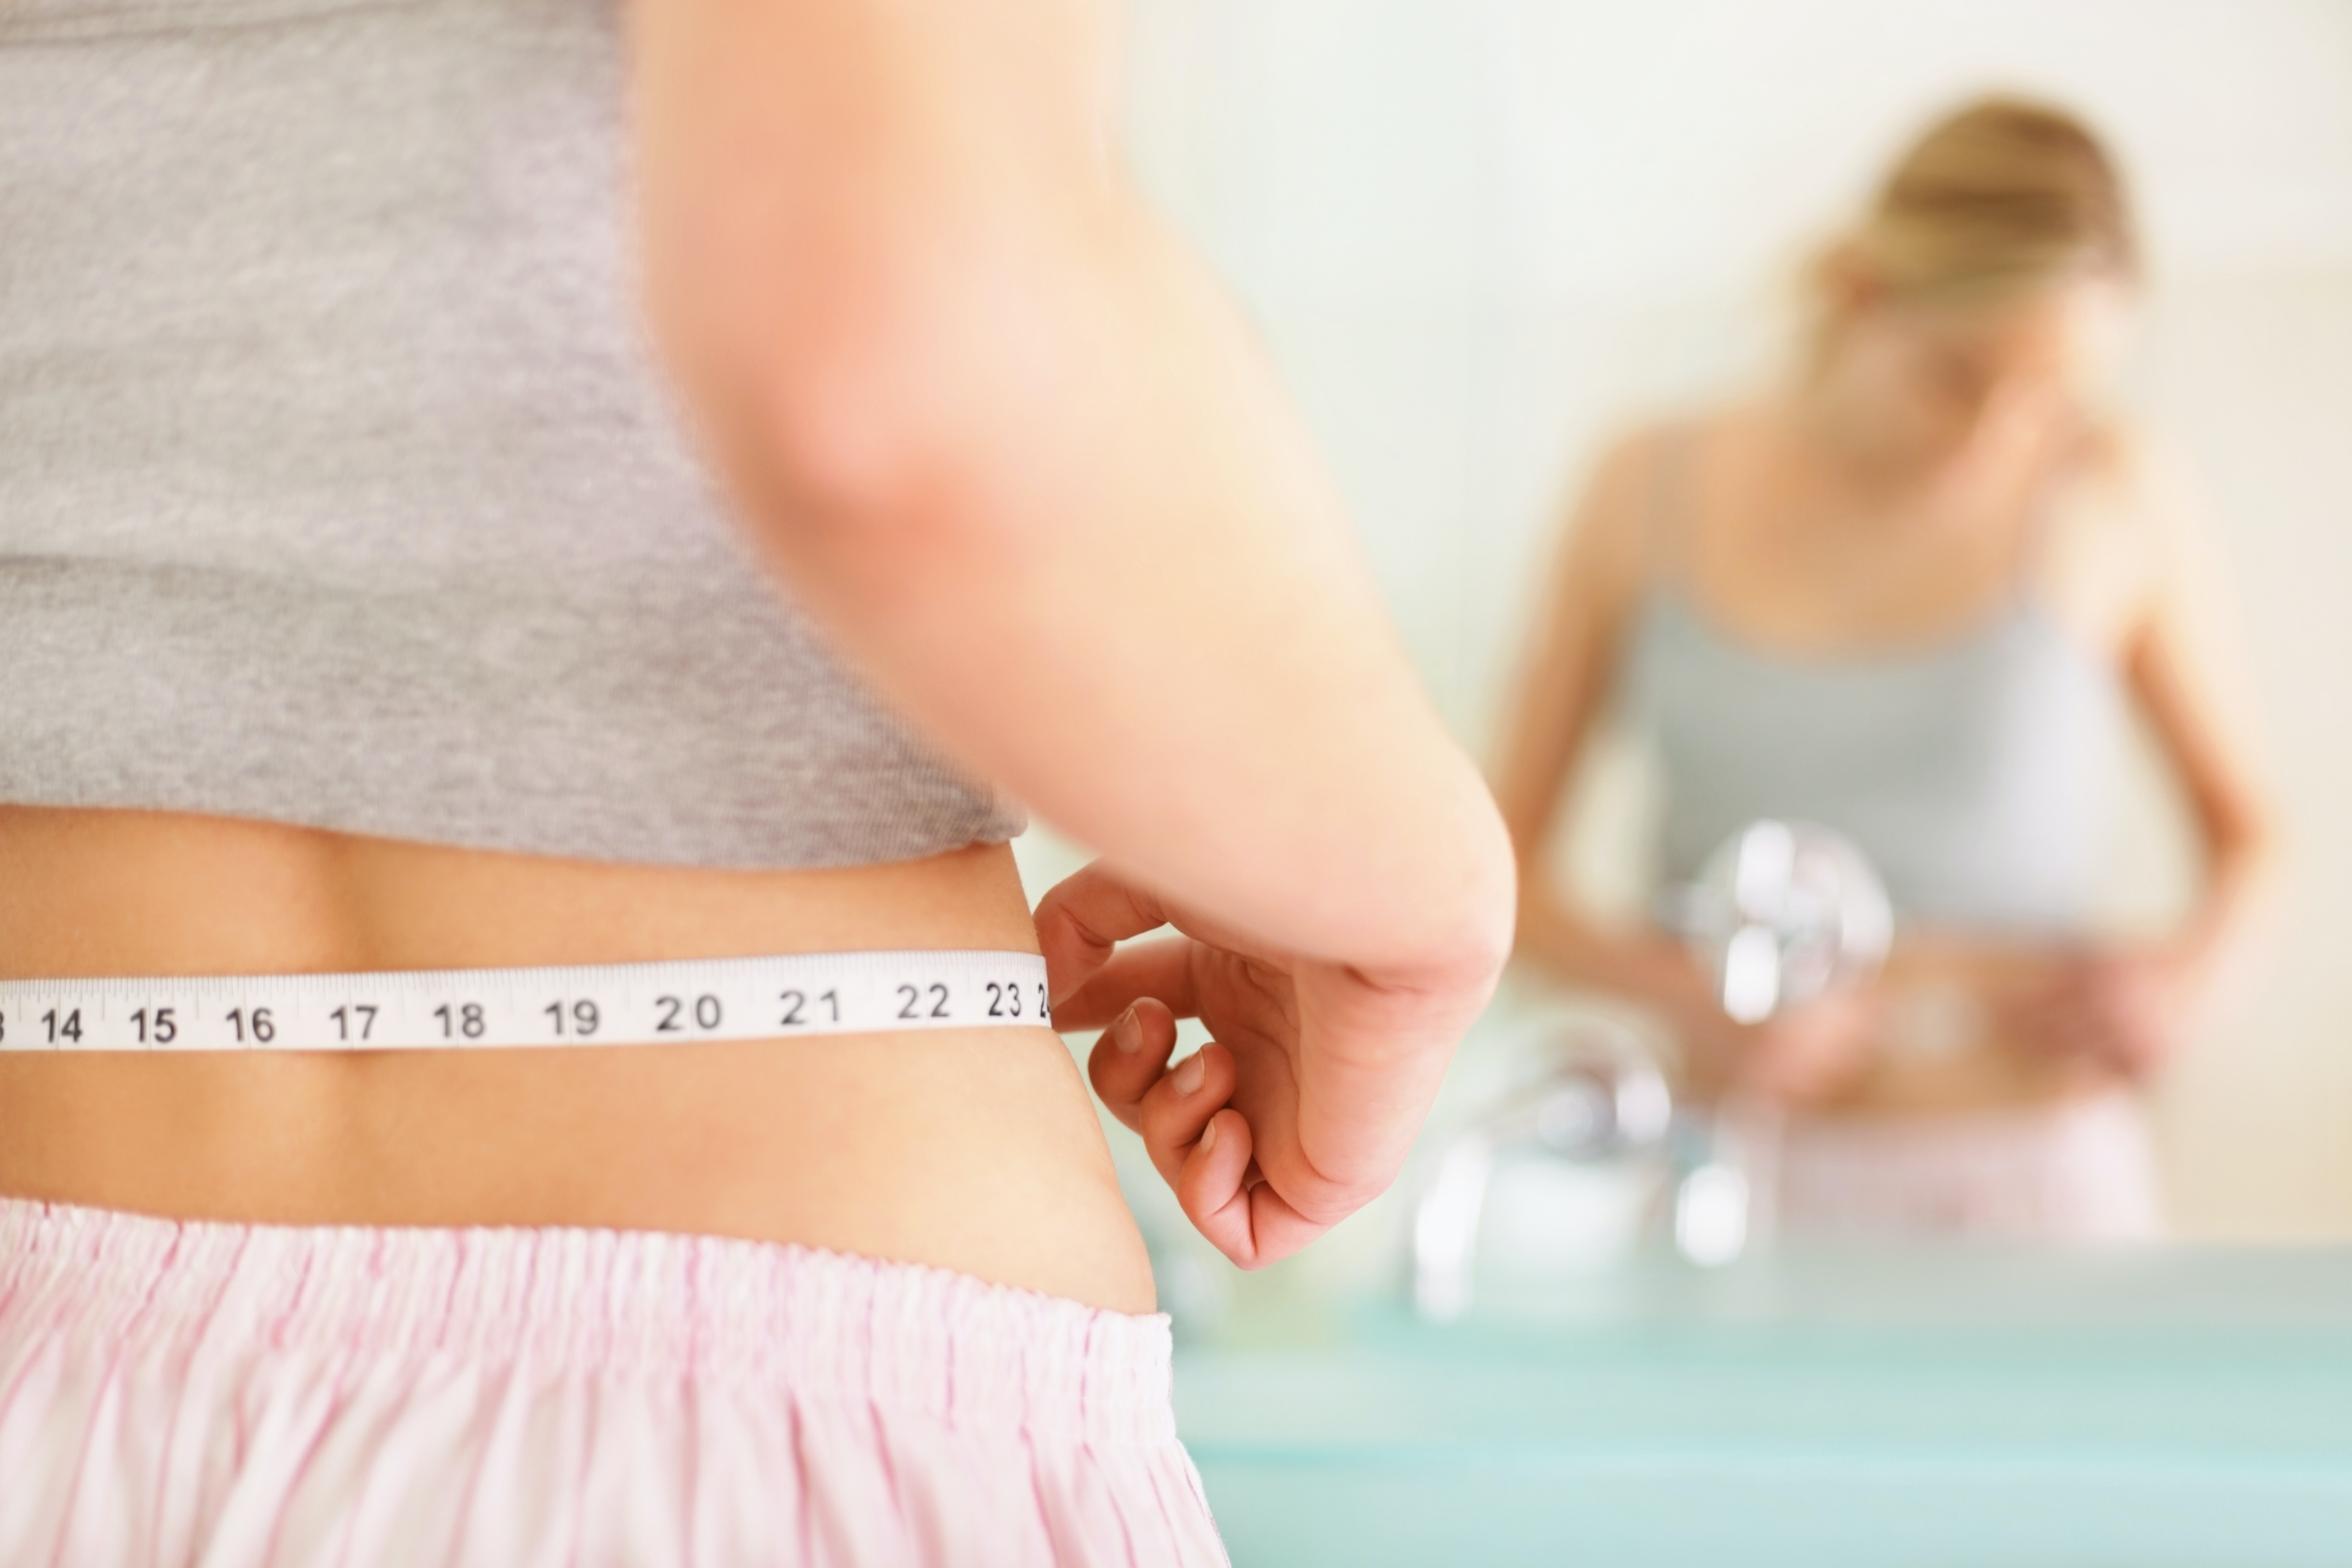 beregn vægttab